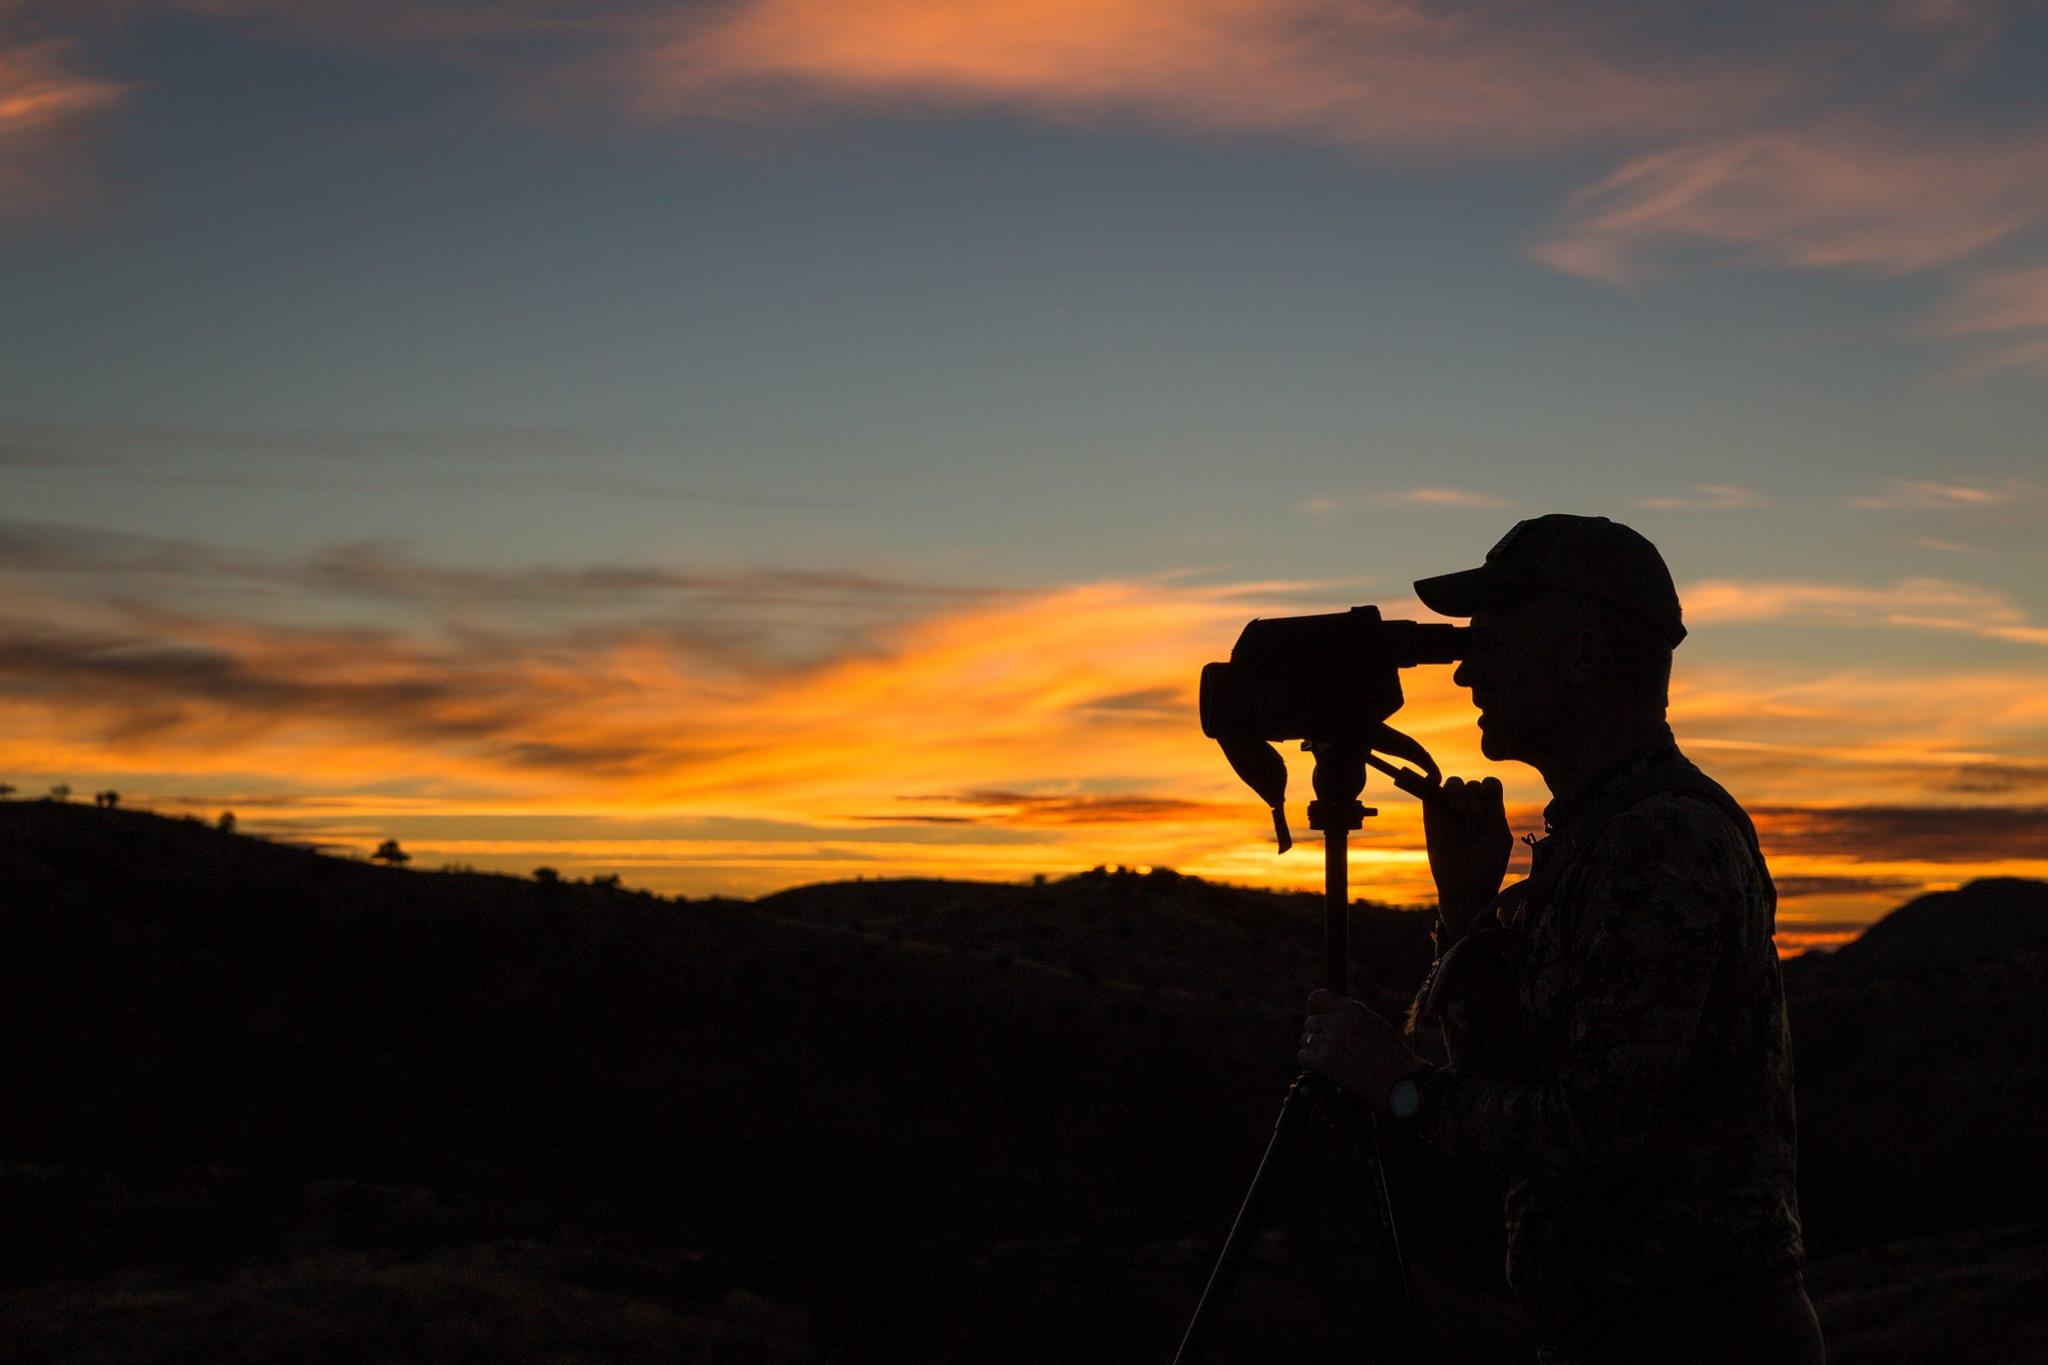 Randy-Newberg-hunter-unfiltered-podcast-videos-watch-outdoors-waypointtv.jpg